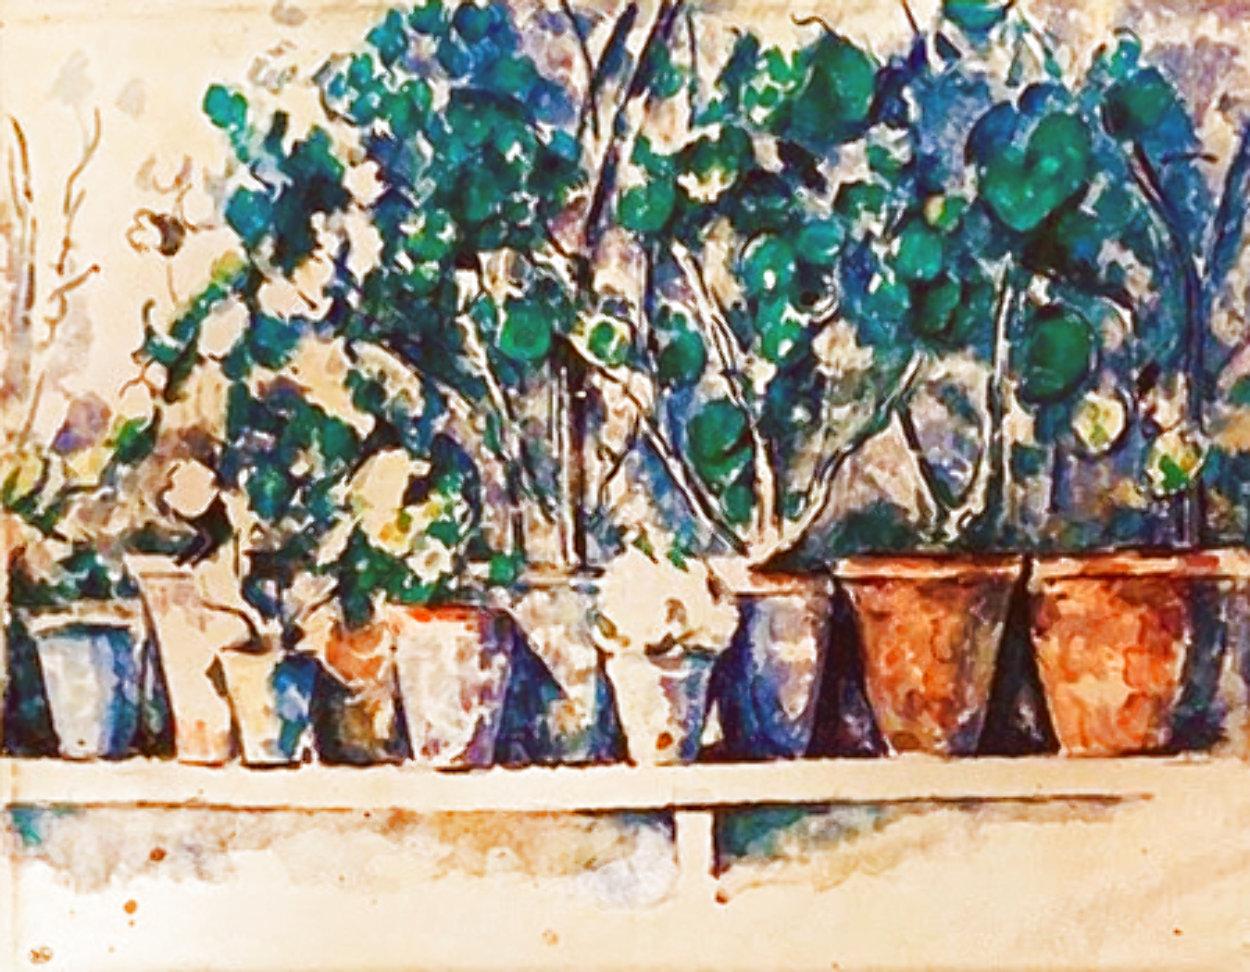 Tavola 6 Limited Edition Print by Paul Cezanne